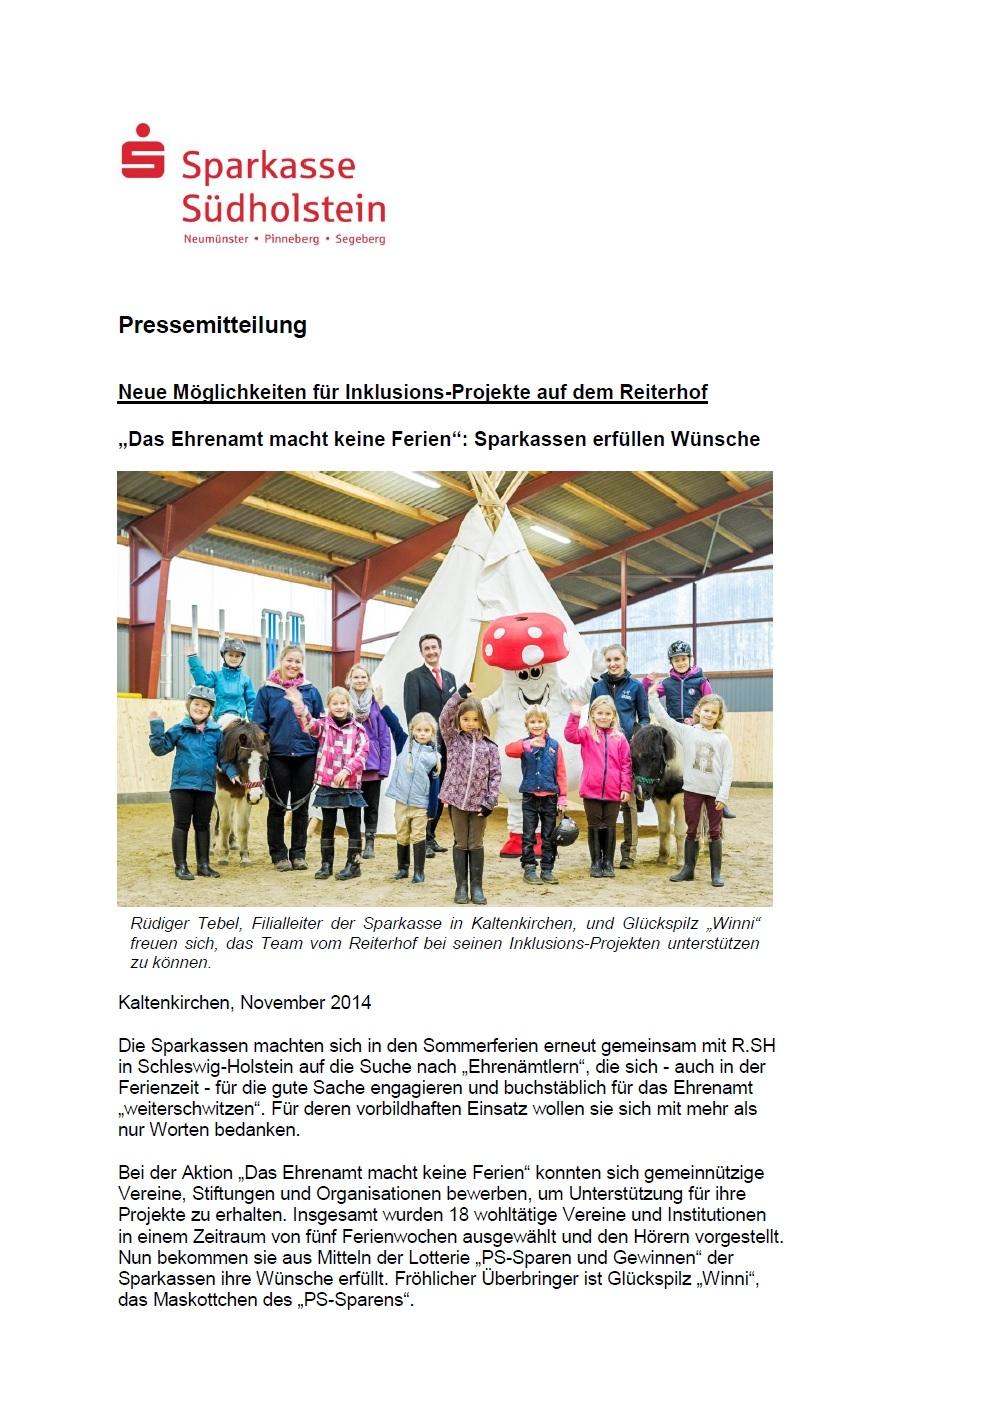 Presse_Sparkasse_Tipi_2014_Seite1